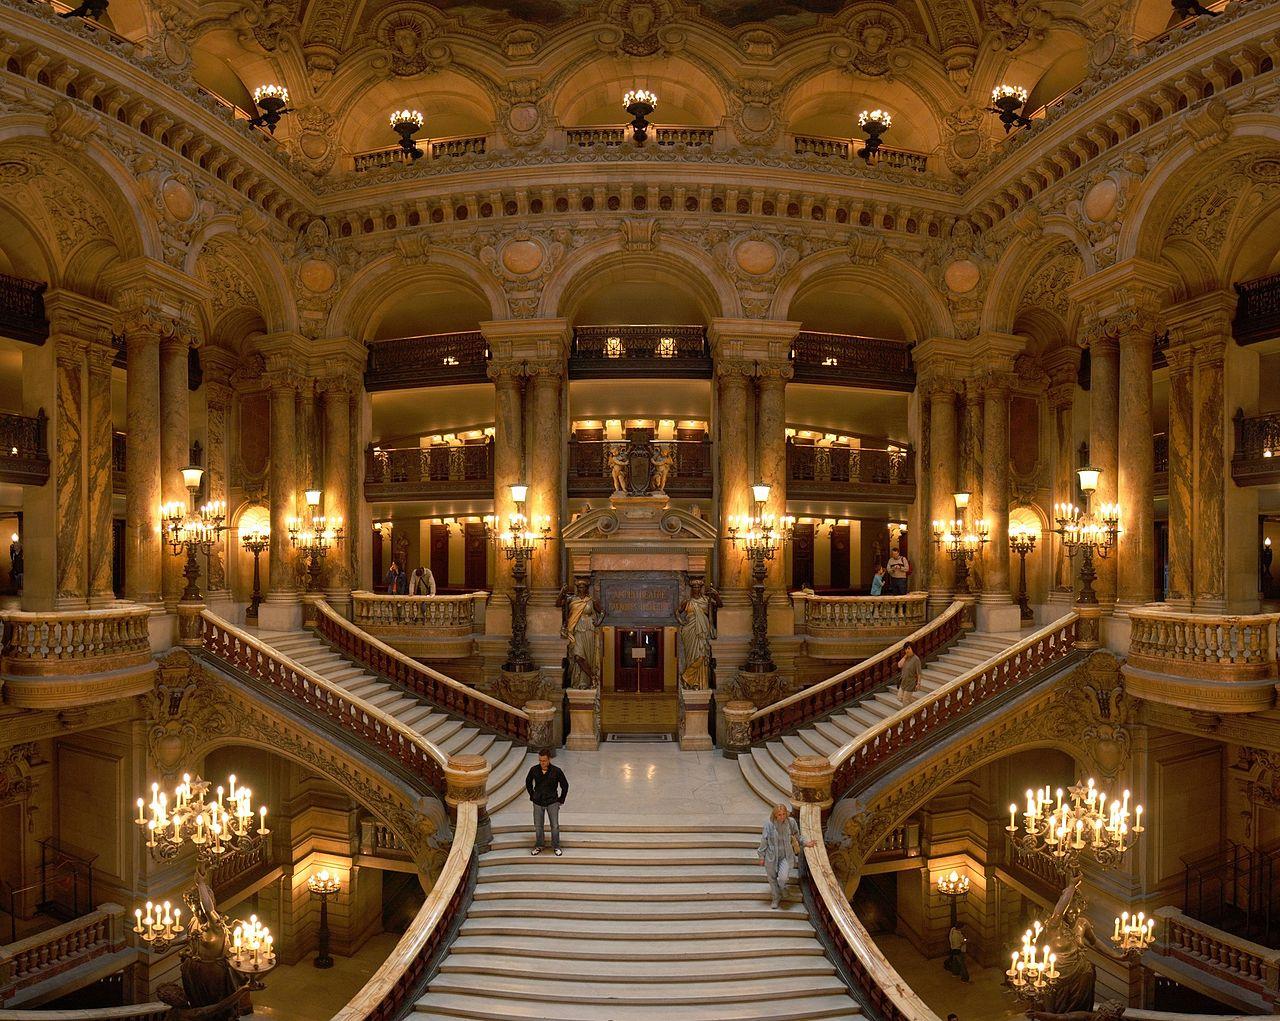 Opera_Garnier_Grand_Escalier Benh LIEU SONG